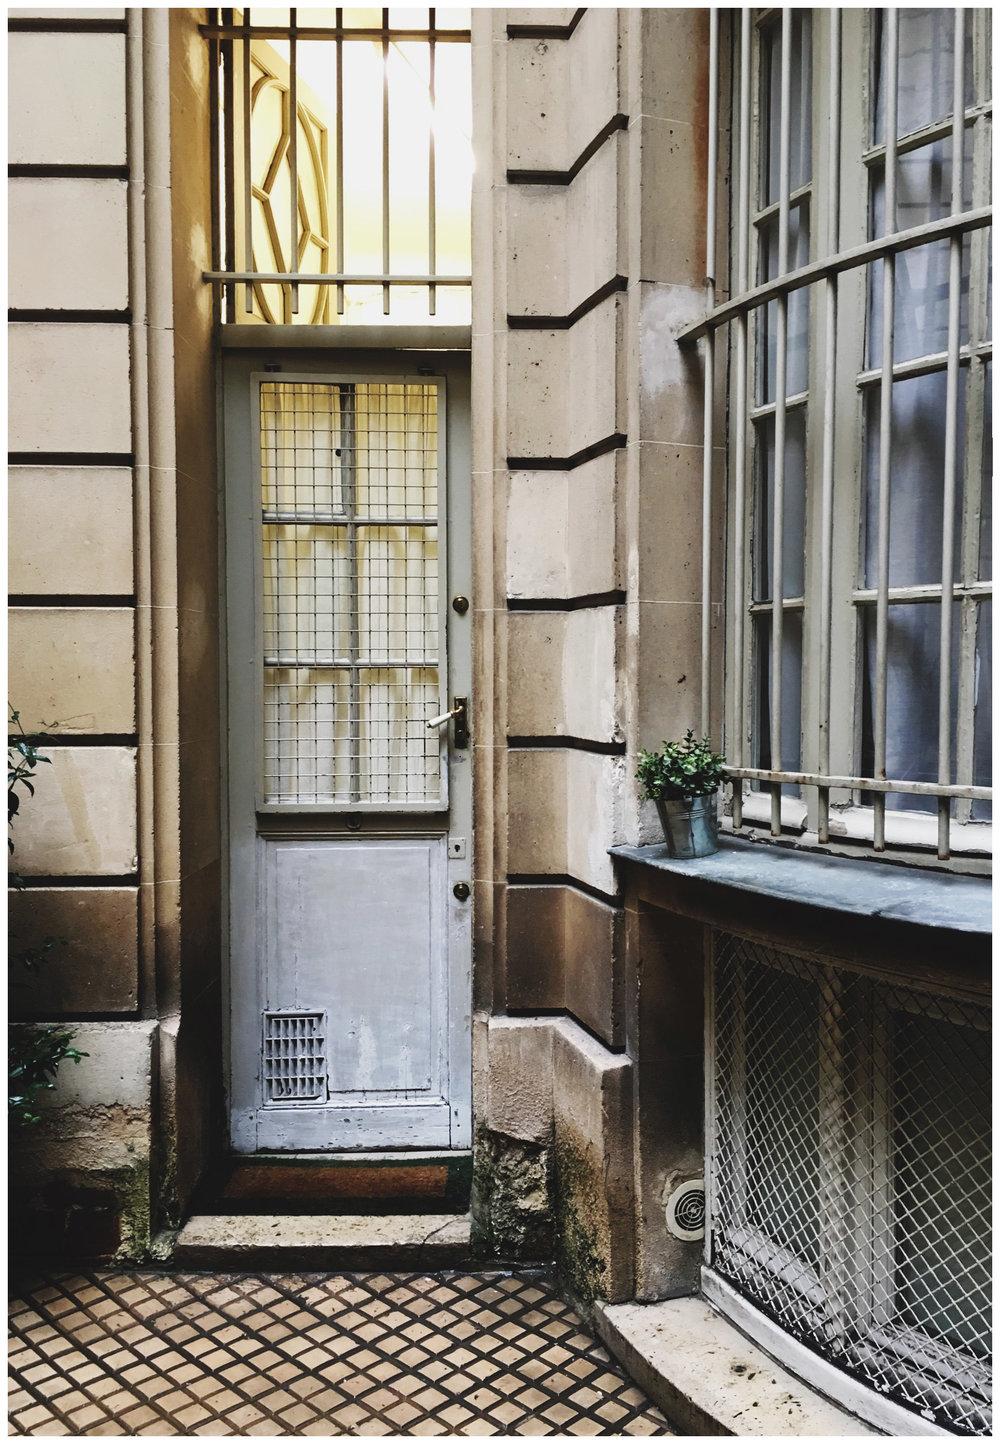 paris-reise-tagebuch-travelguide_11